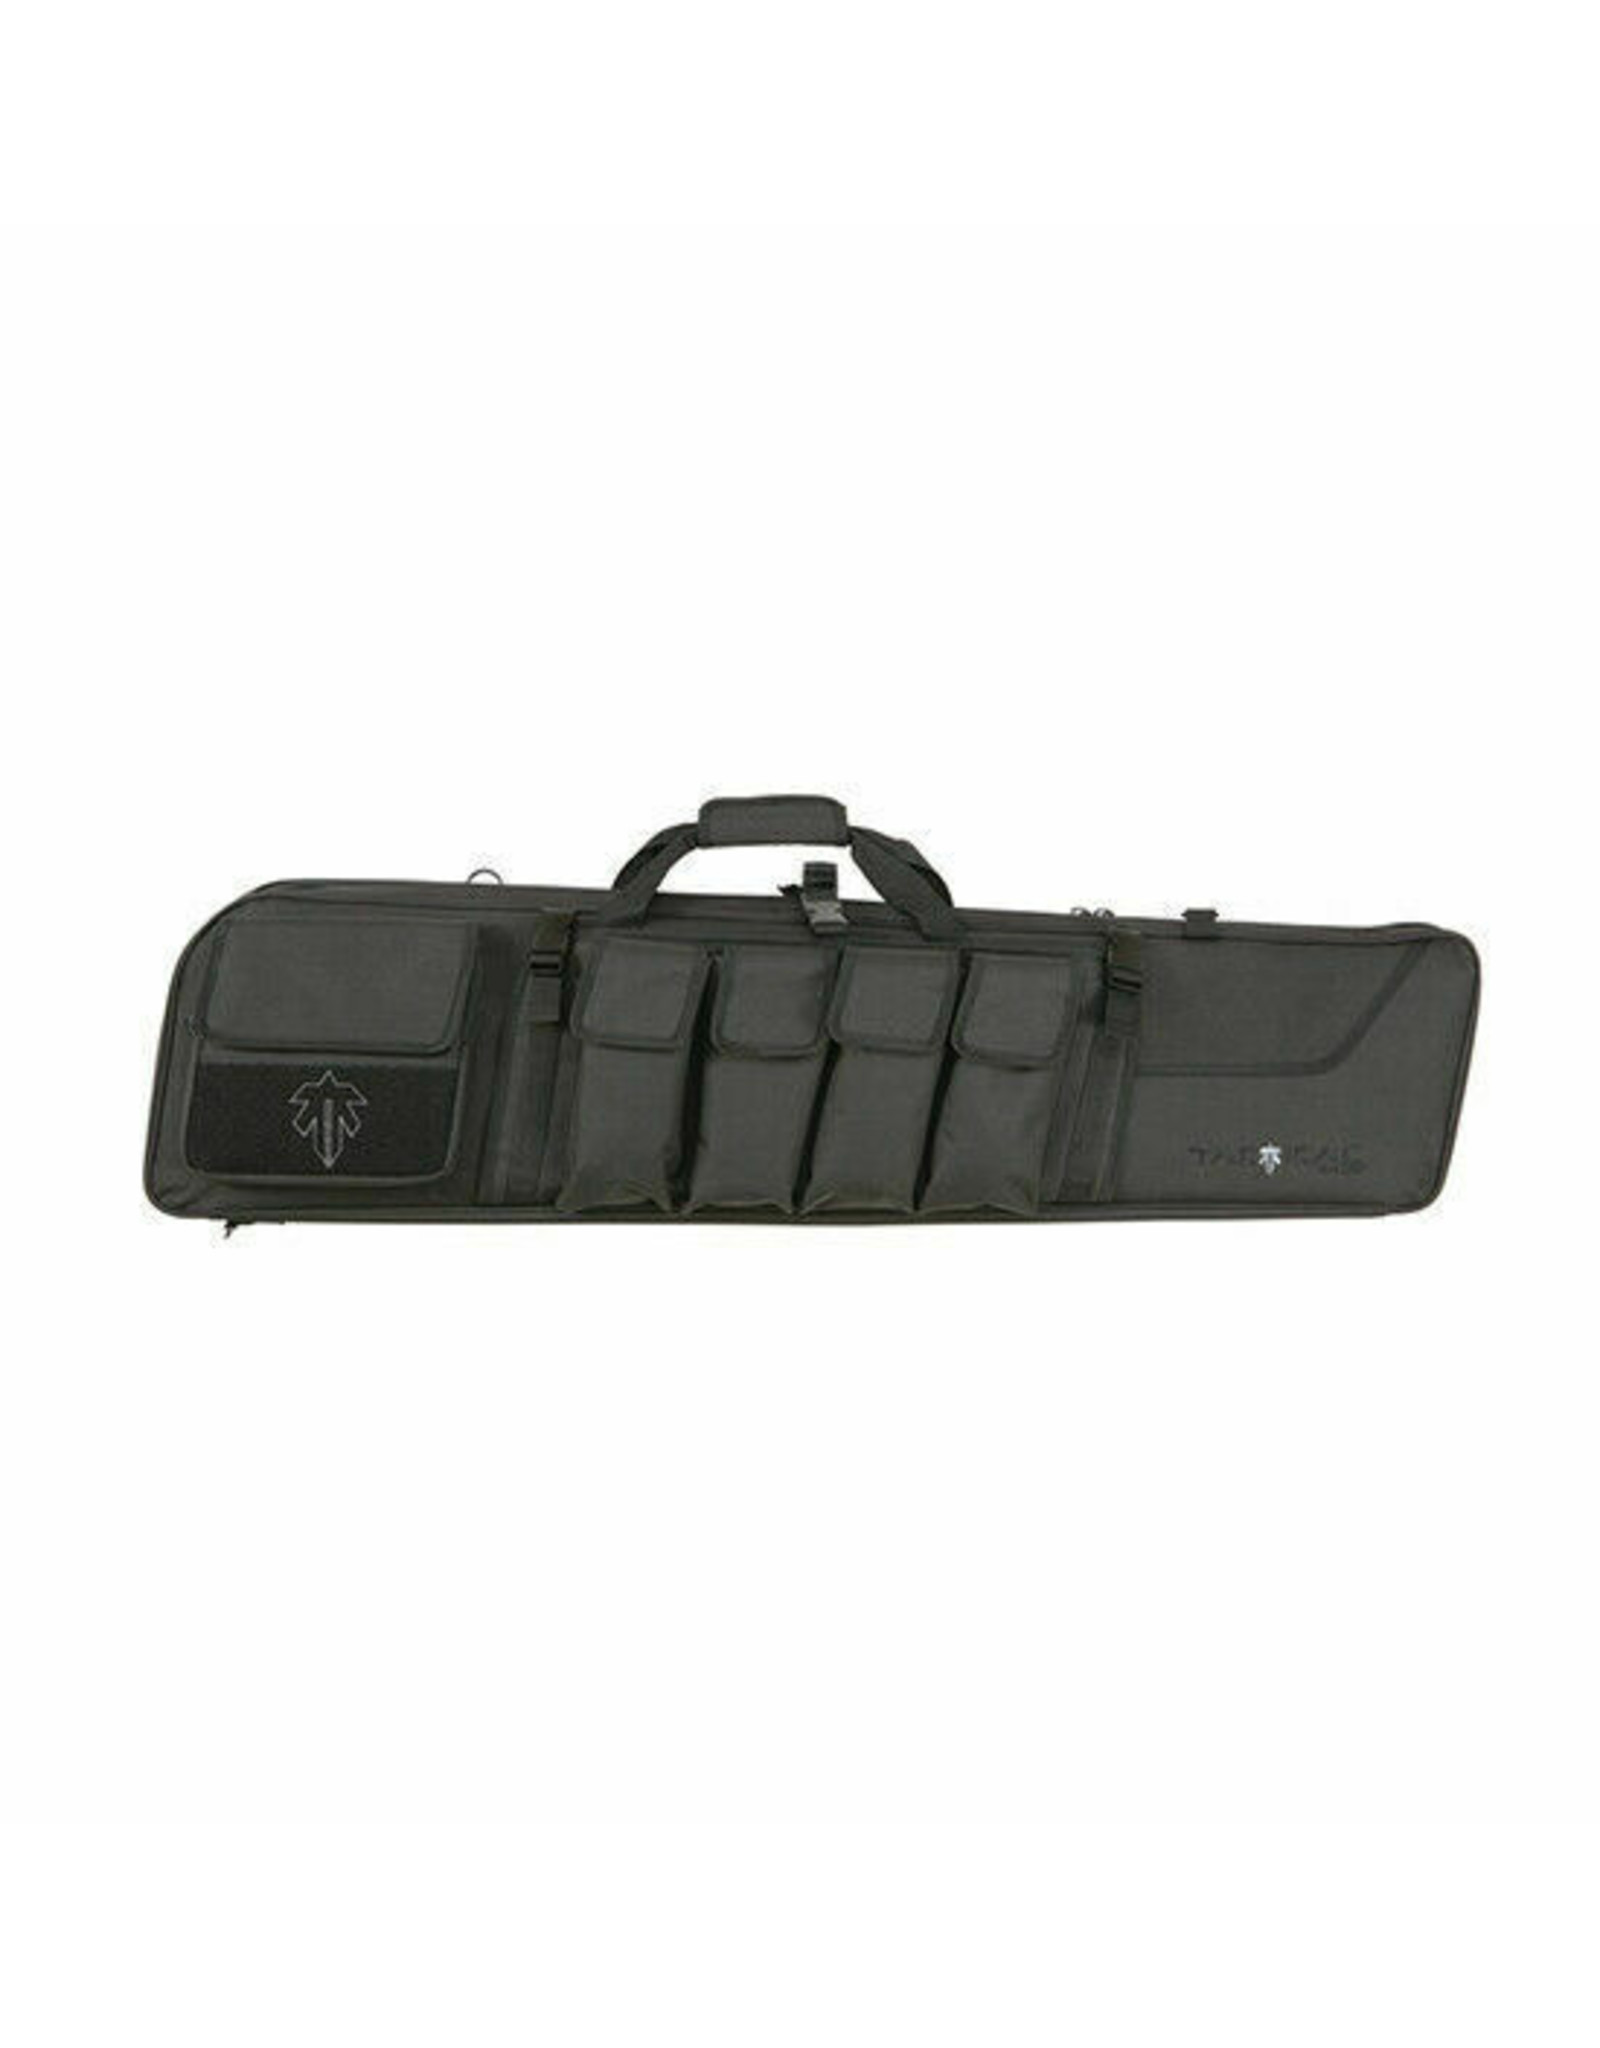 "Allen Allen Operator Gear Fit Tactical Rifle Case 44"" Black"